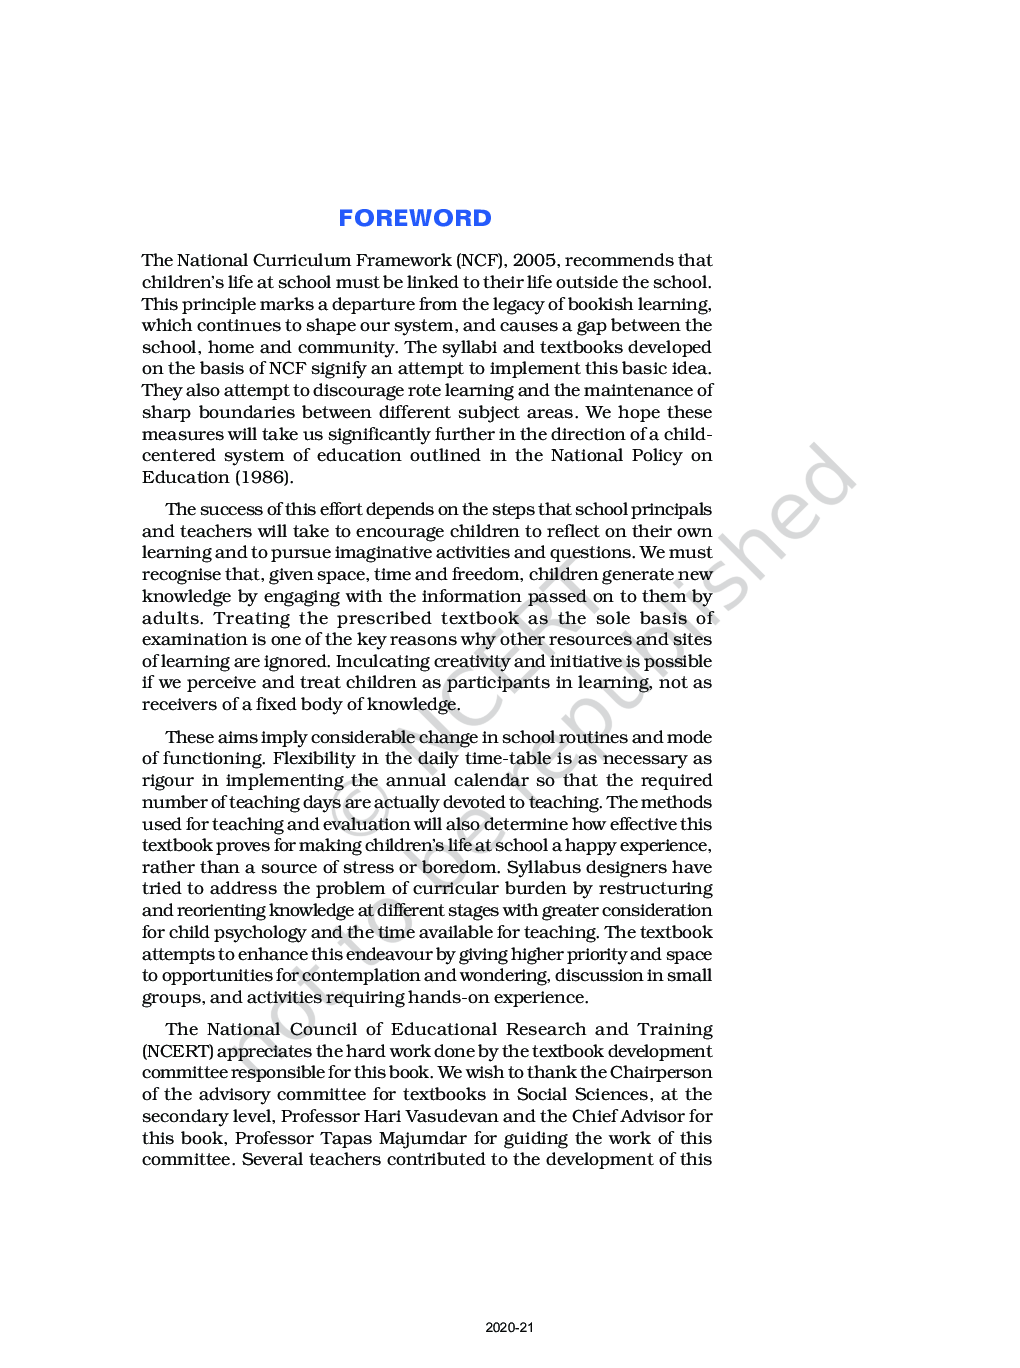 NCERT Understanding Economic Development Social Science Textbook For Class X - Page 4